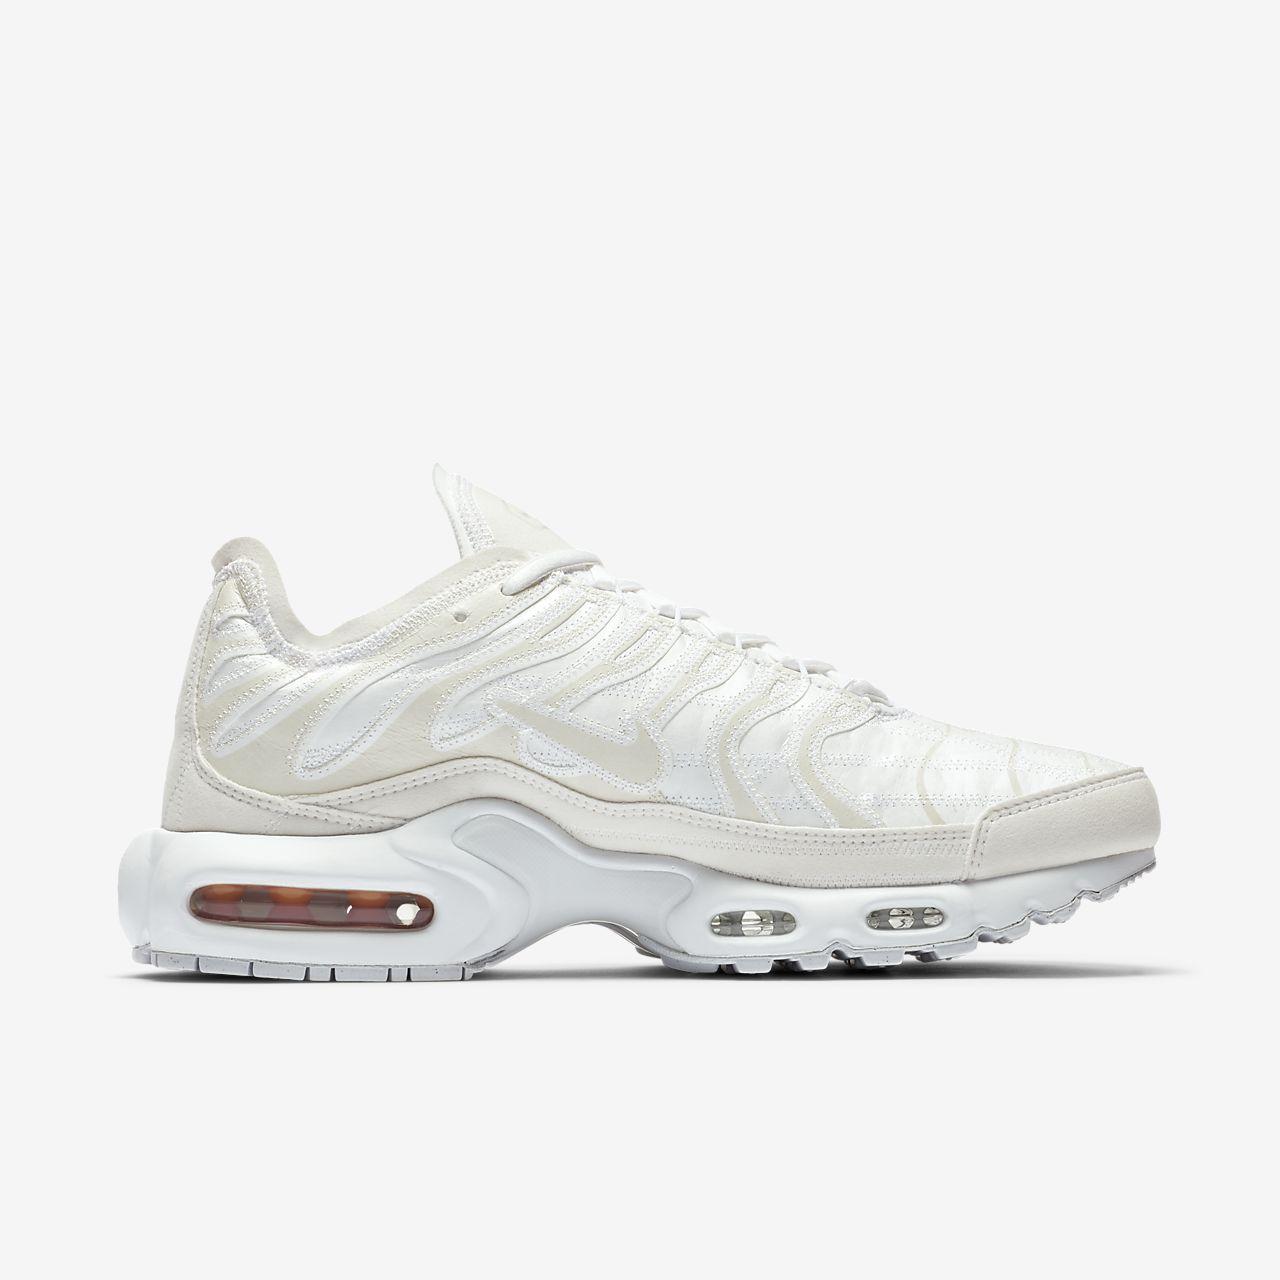 cheaper ec63d cf144 Nike Air Max Plus Deconstructed Men's Shoe